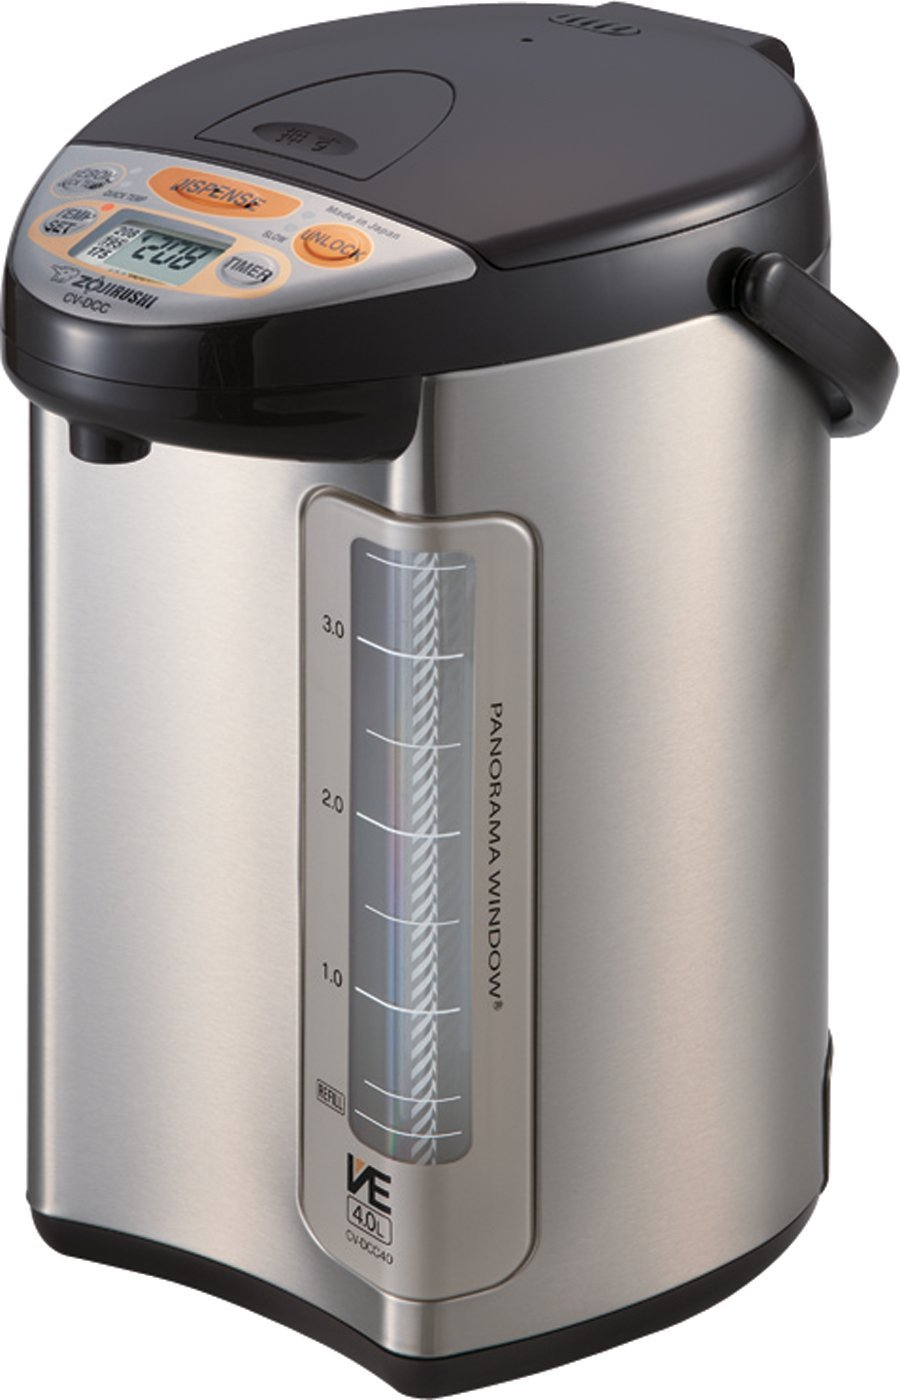 Zojirushi Water Boiler/Dispenser